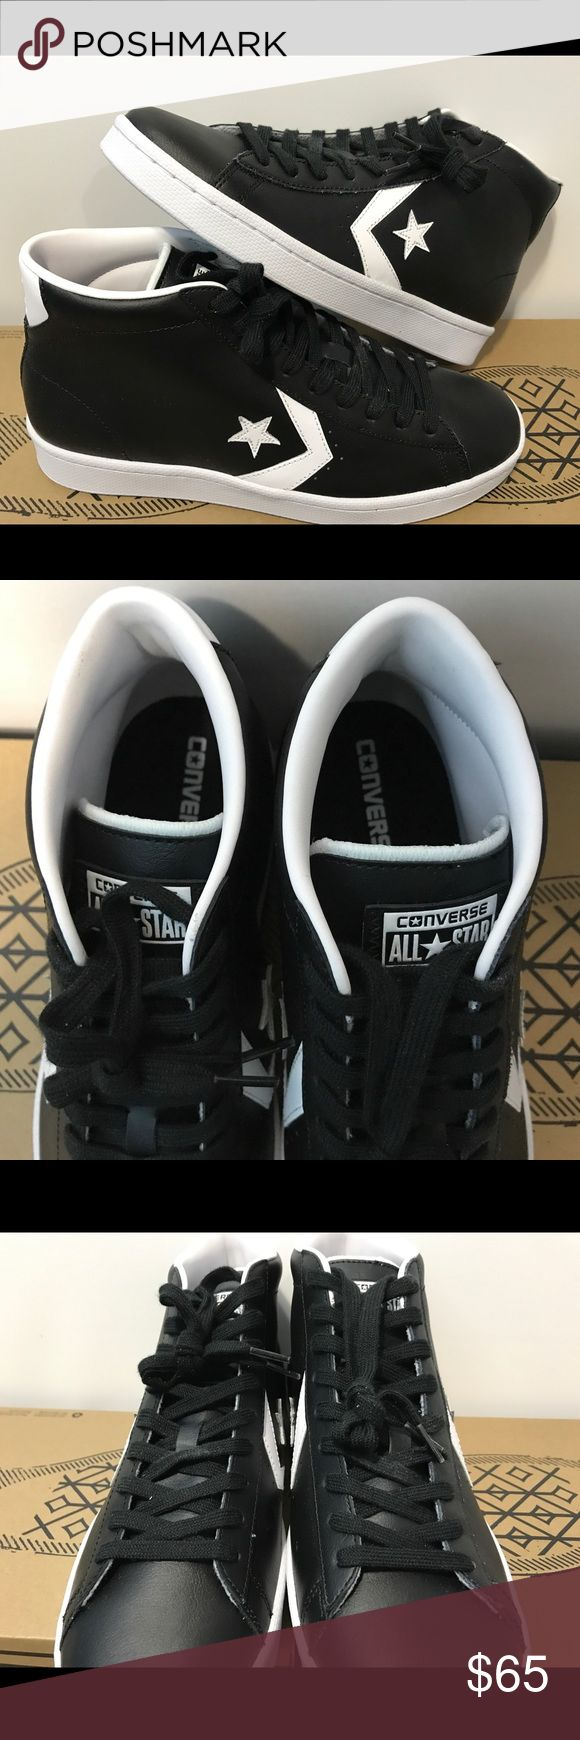 converse pro leather box